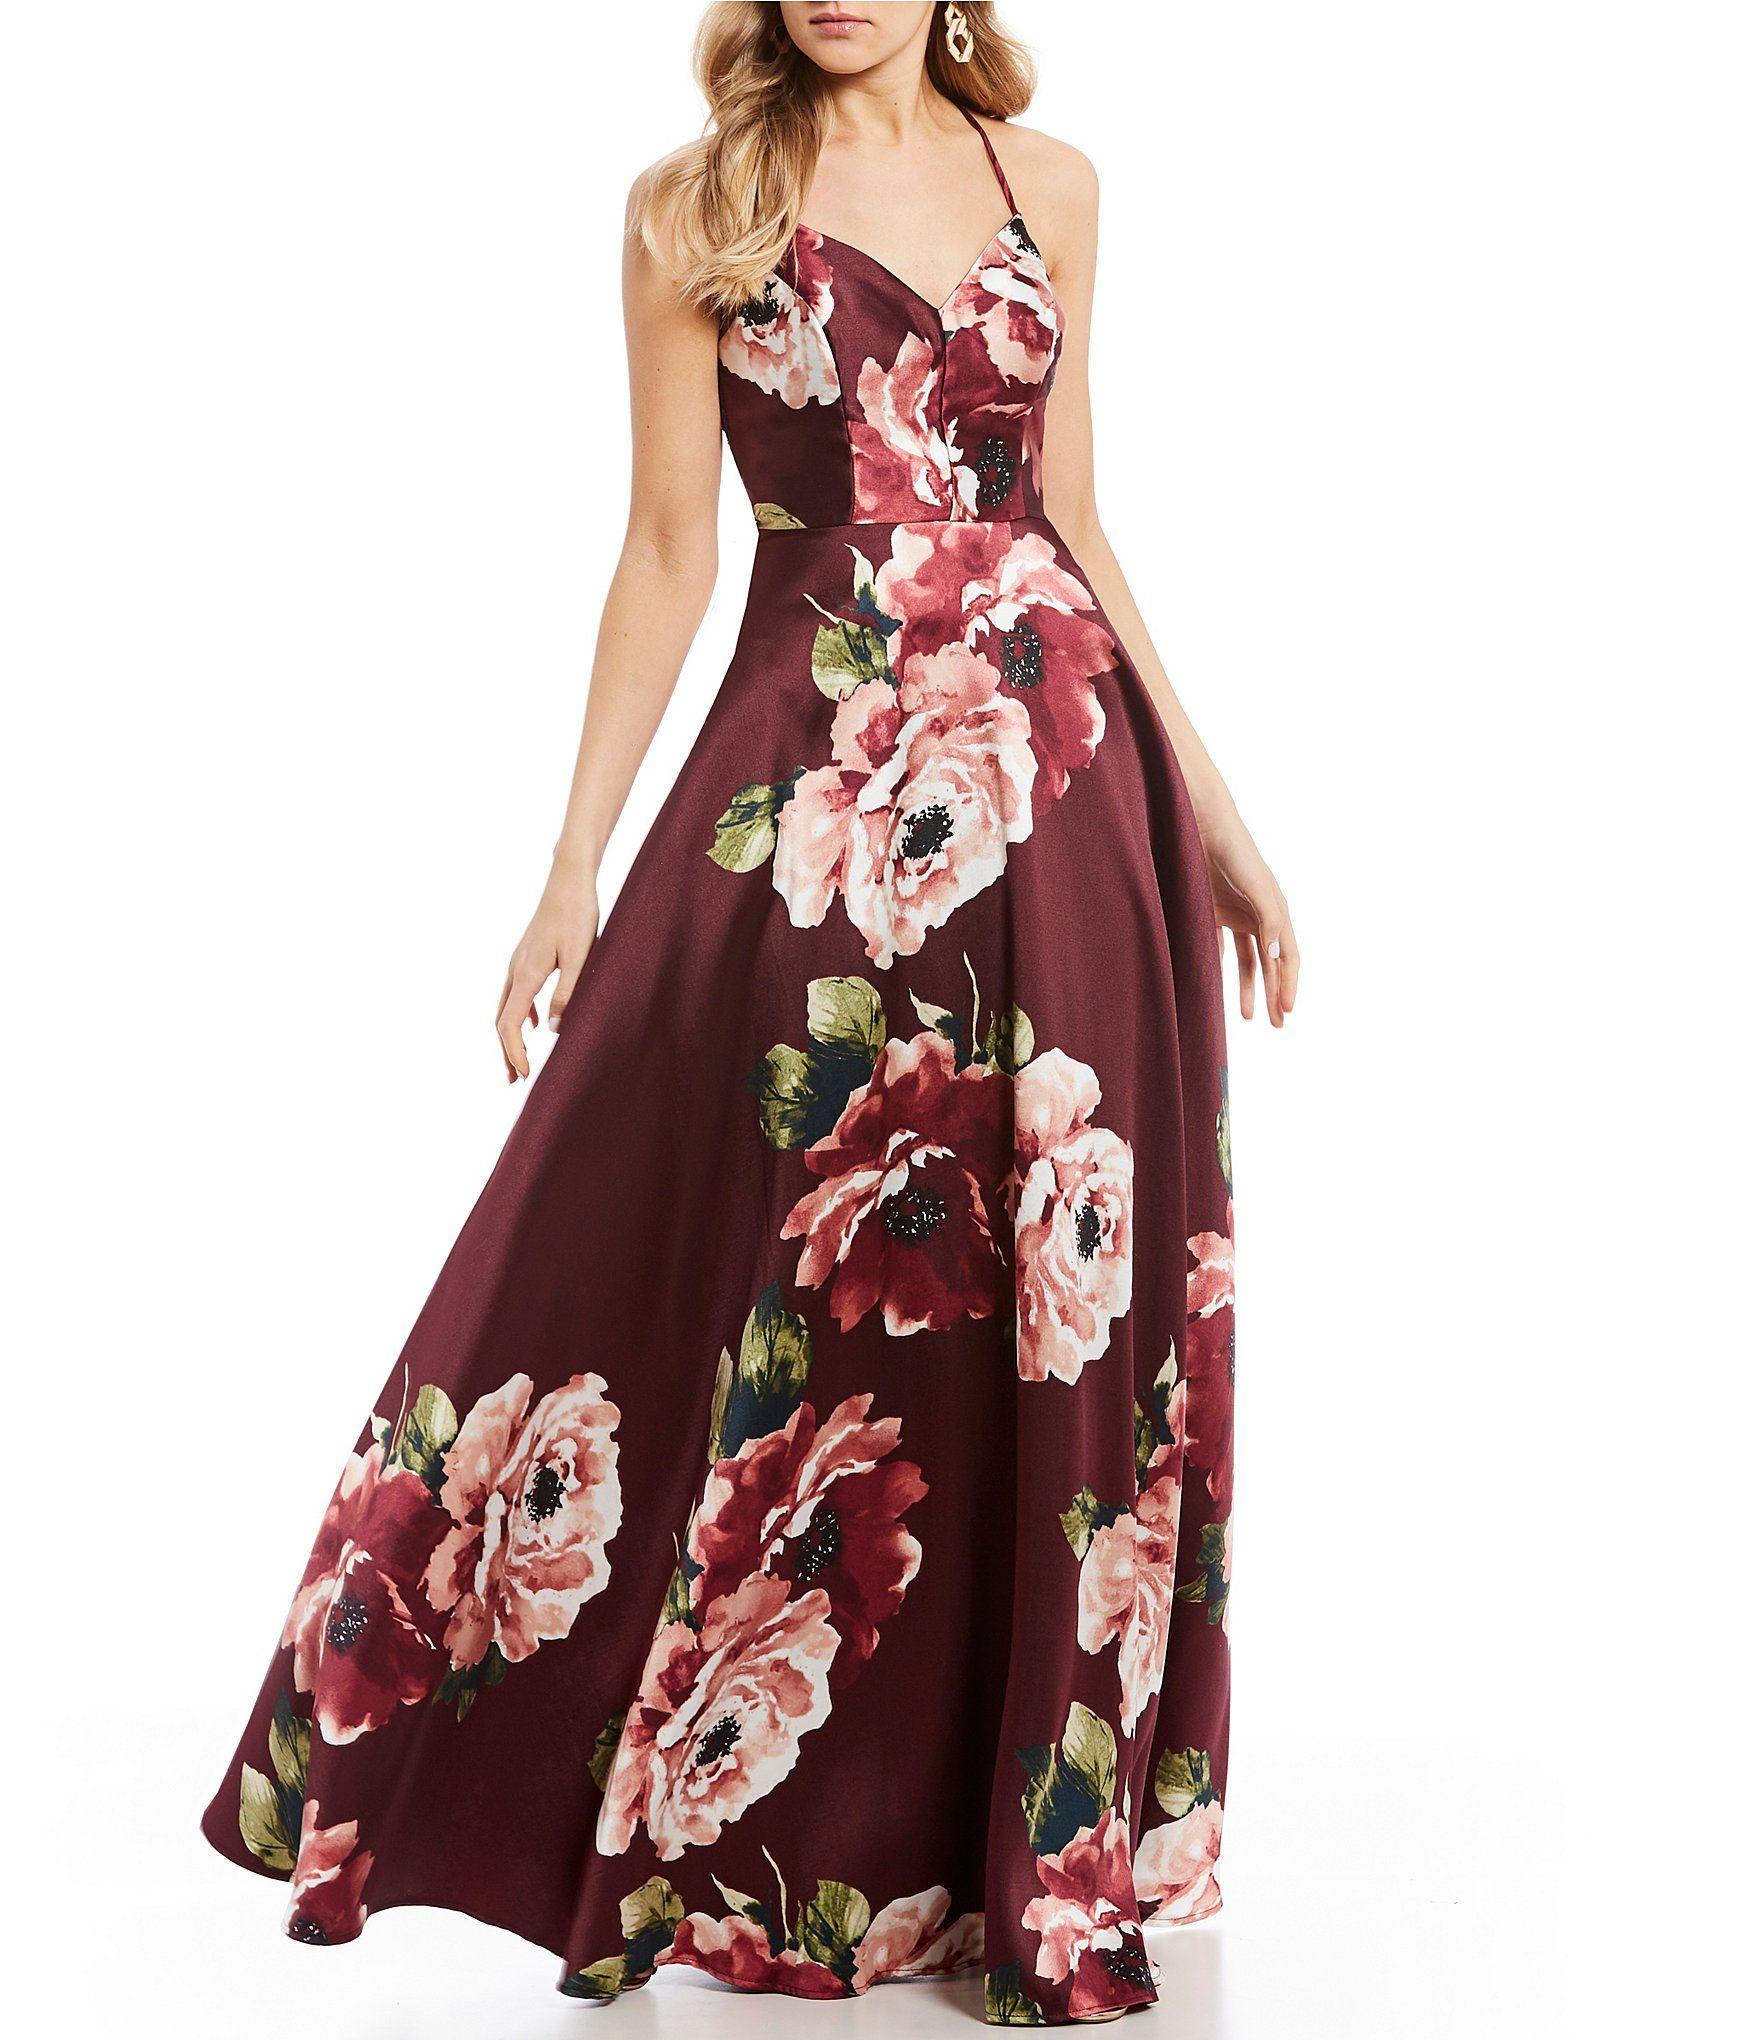 902d8dabbd4 Shop for Jodi Kristopher Floral Print Lace-Bralette Back Ball Gown at  Dillards.com. Visit Dillards.com to find clothing